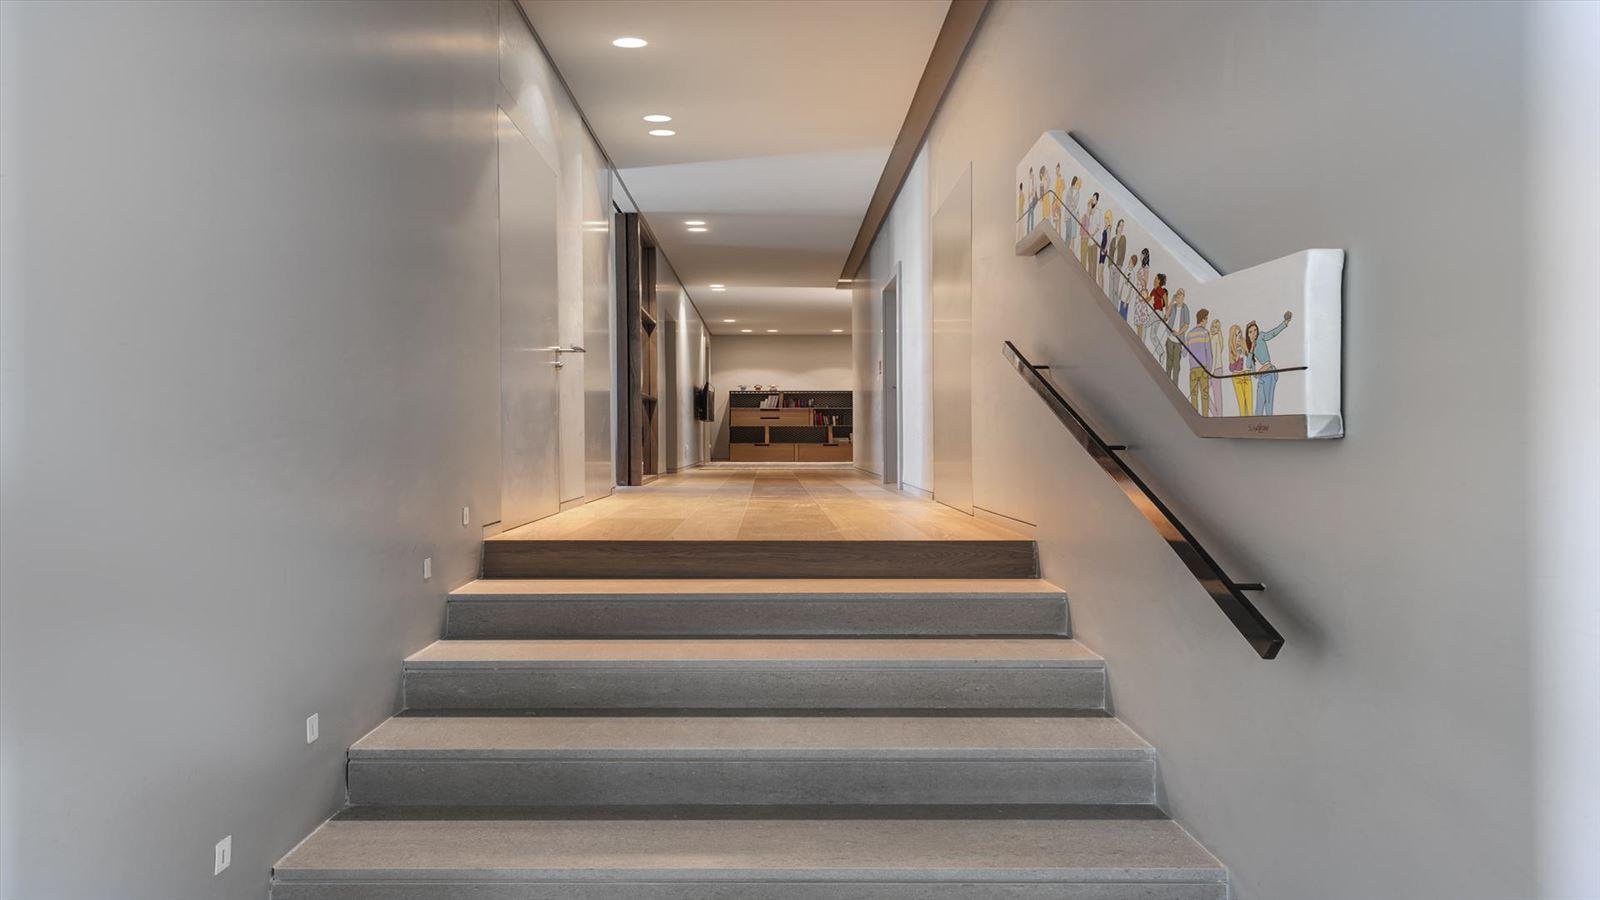 CENTRAL TLV LOFT מסדרון הבית בגופי תאורה מיוחדים על ידי קמחי תאורה